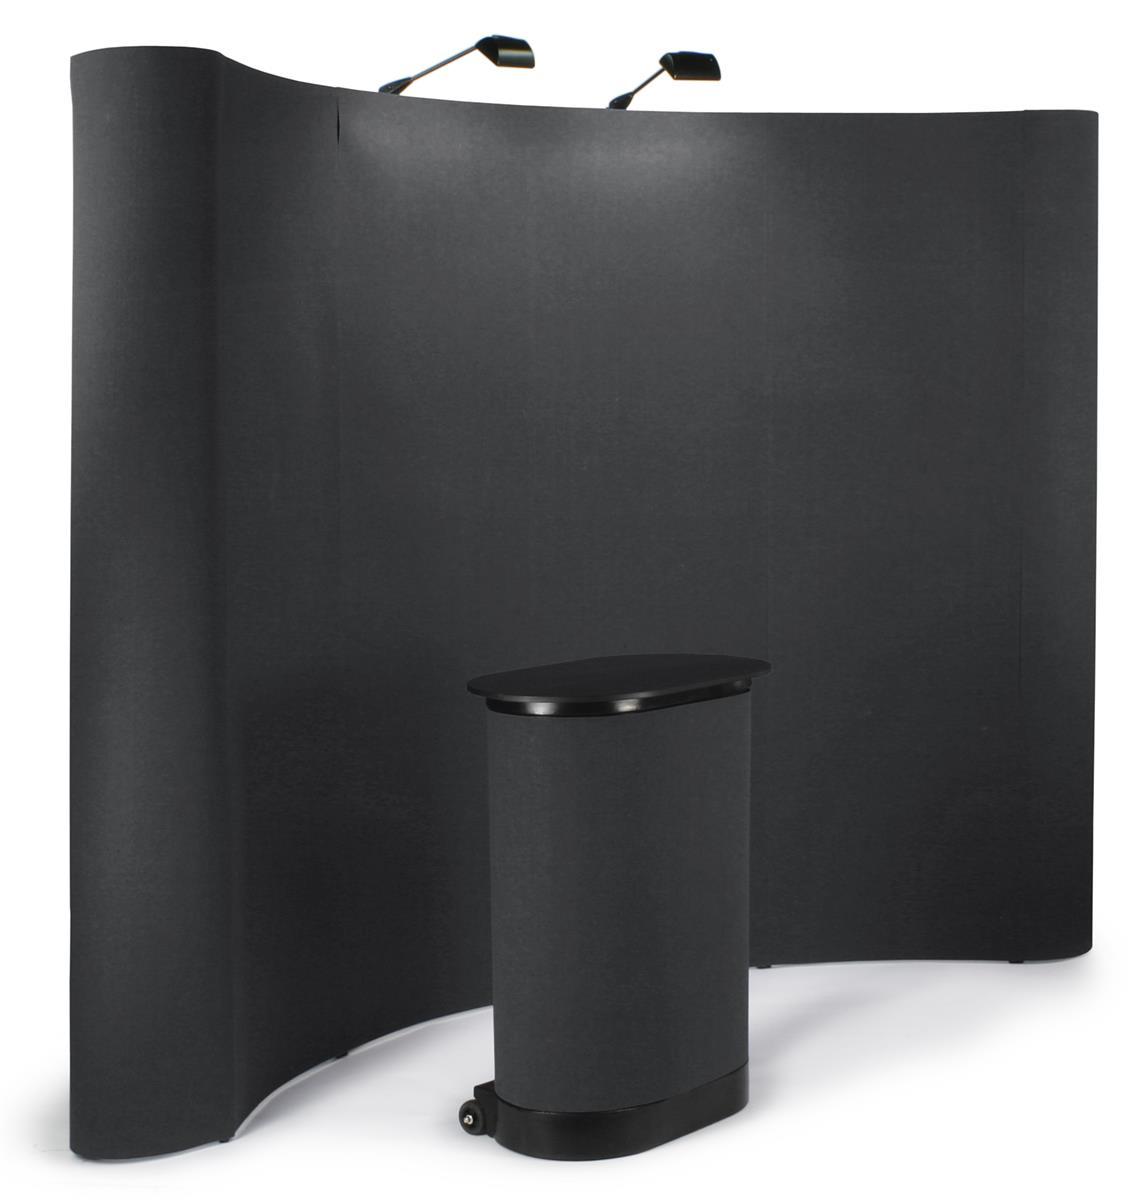 Displays2go 10' Curved Pop Up Display w/ Hook-and-Loop Fa...